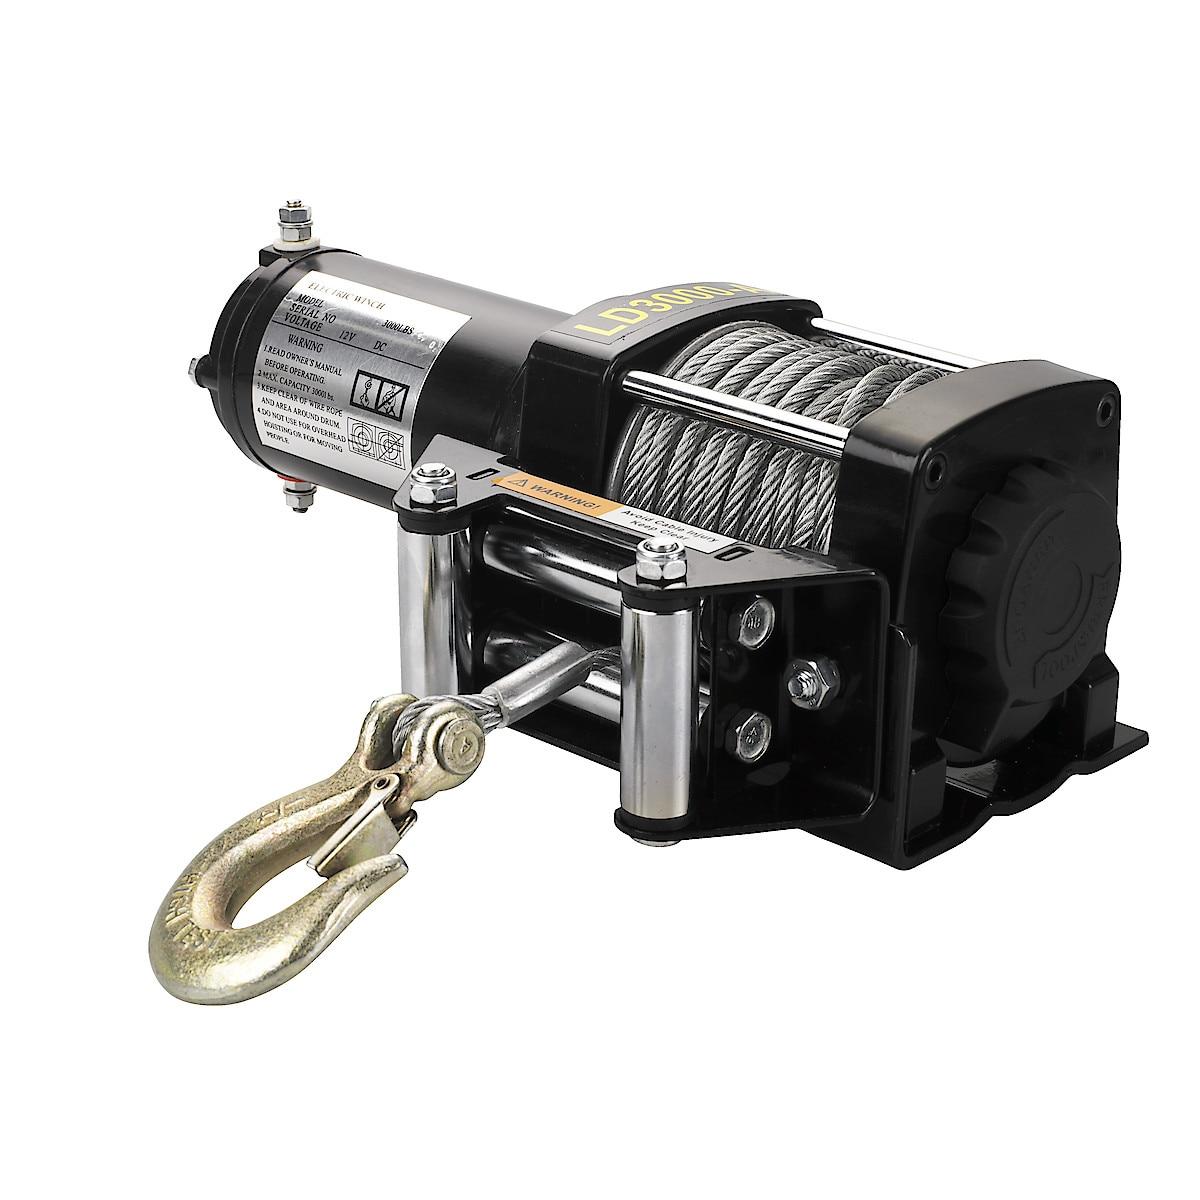 Sähkövinssi 12 V LDW3000-A